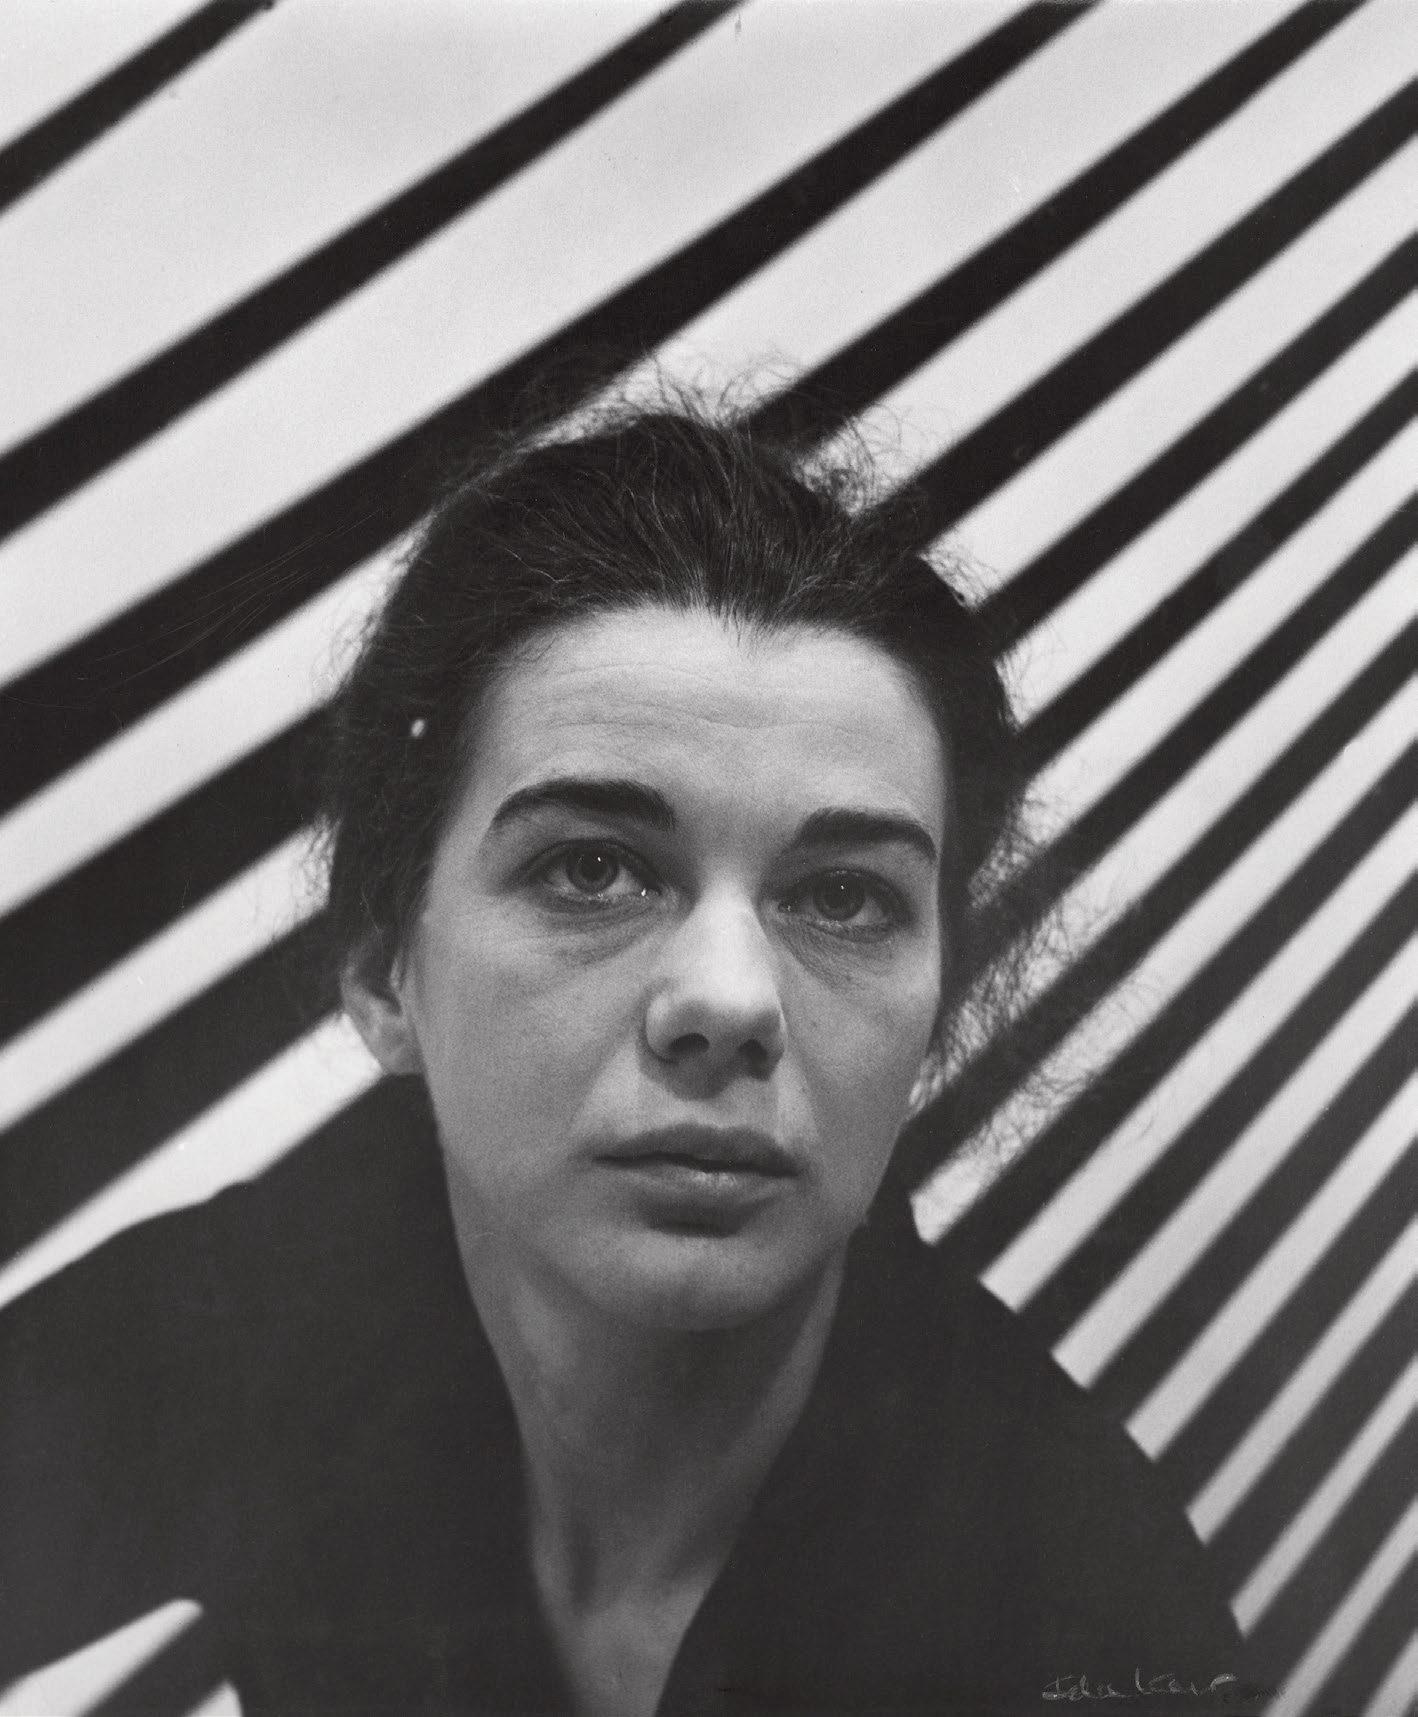 Bridget Riley, 1963, photo by Ida Kar. Image from the book Bridget Riley A Very Very Person.